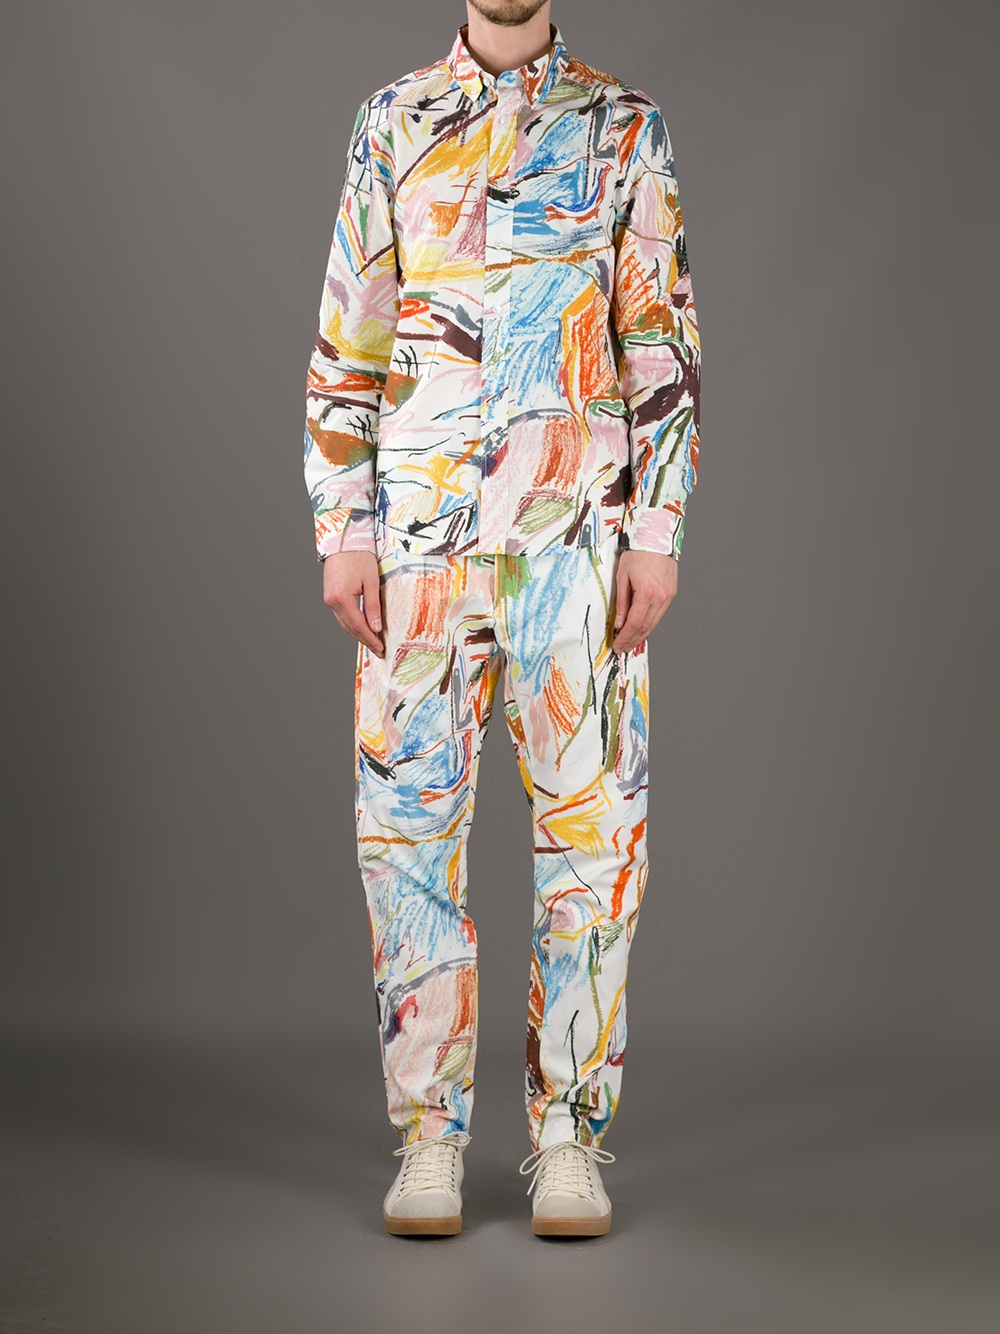 Etudes Studio Robin Cameron Artwork Trouser for Men